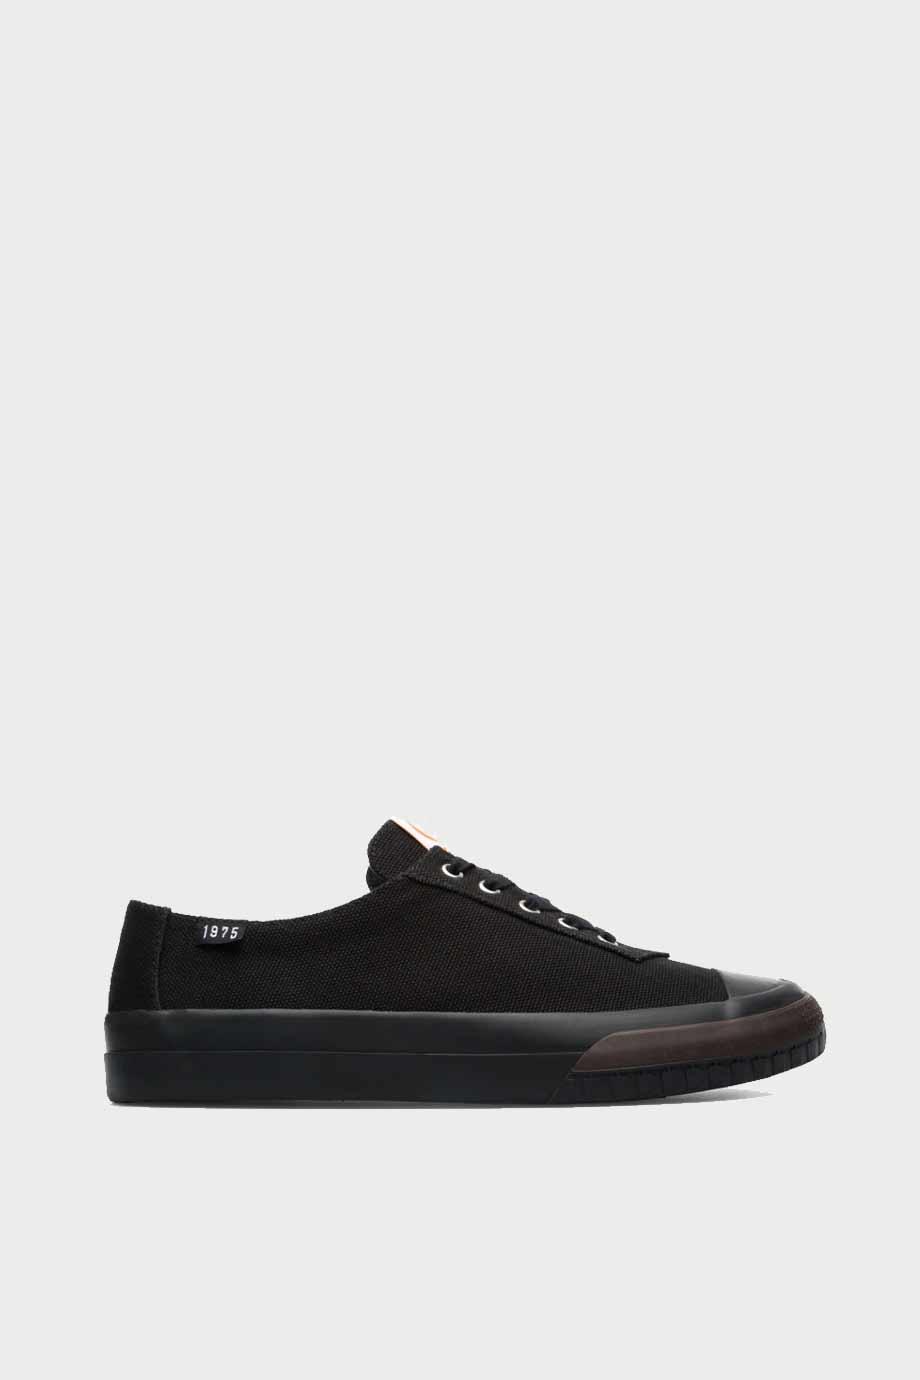 spiridoula metheniti shoes xalkida p Camper K100674 002 Camaleon 1975 black 3